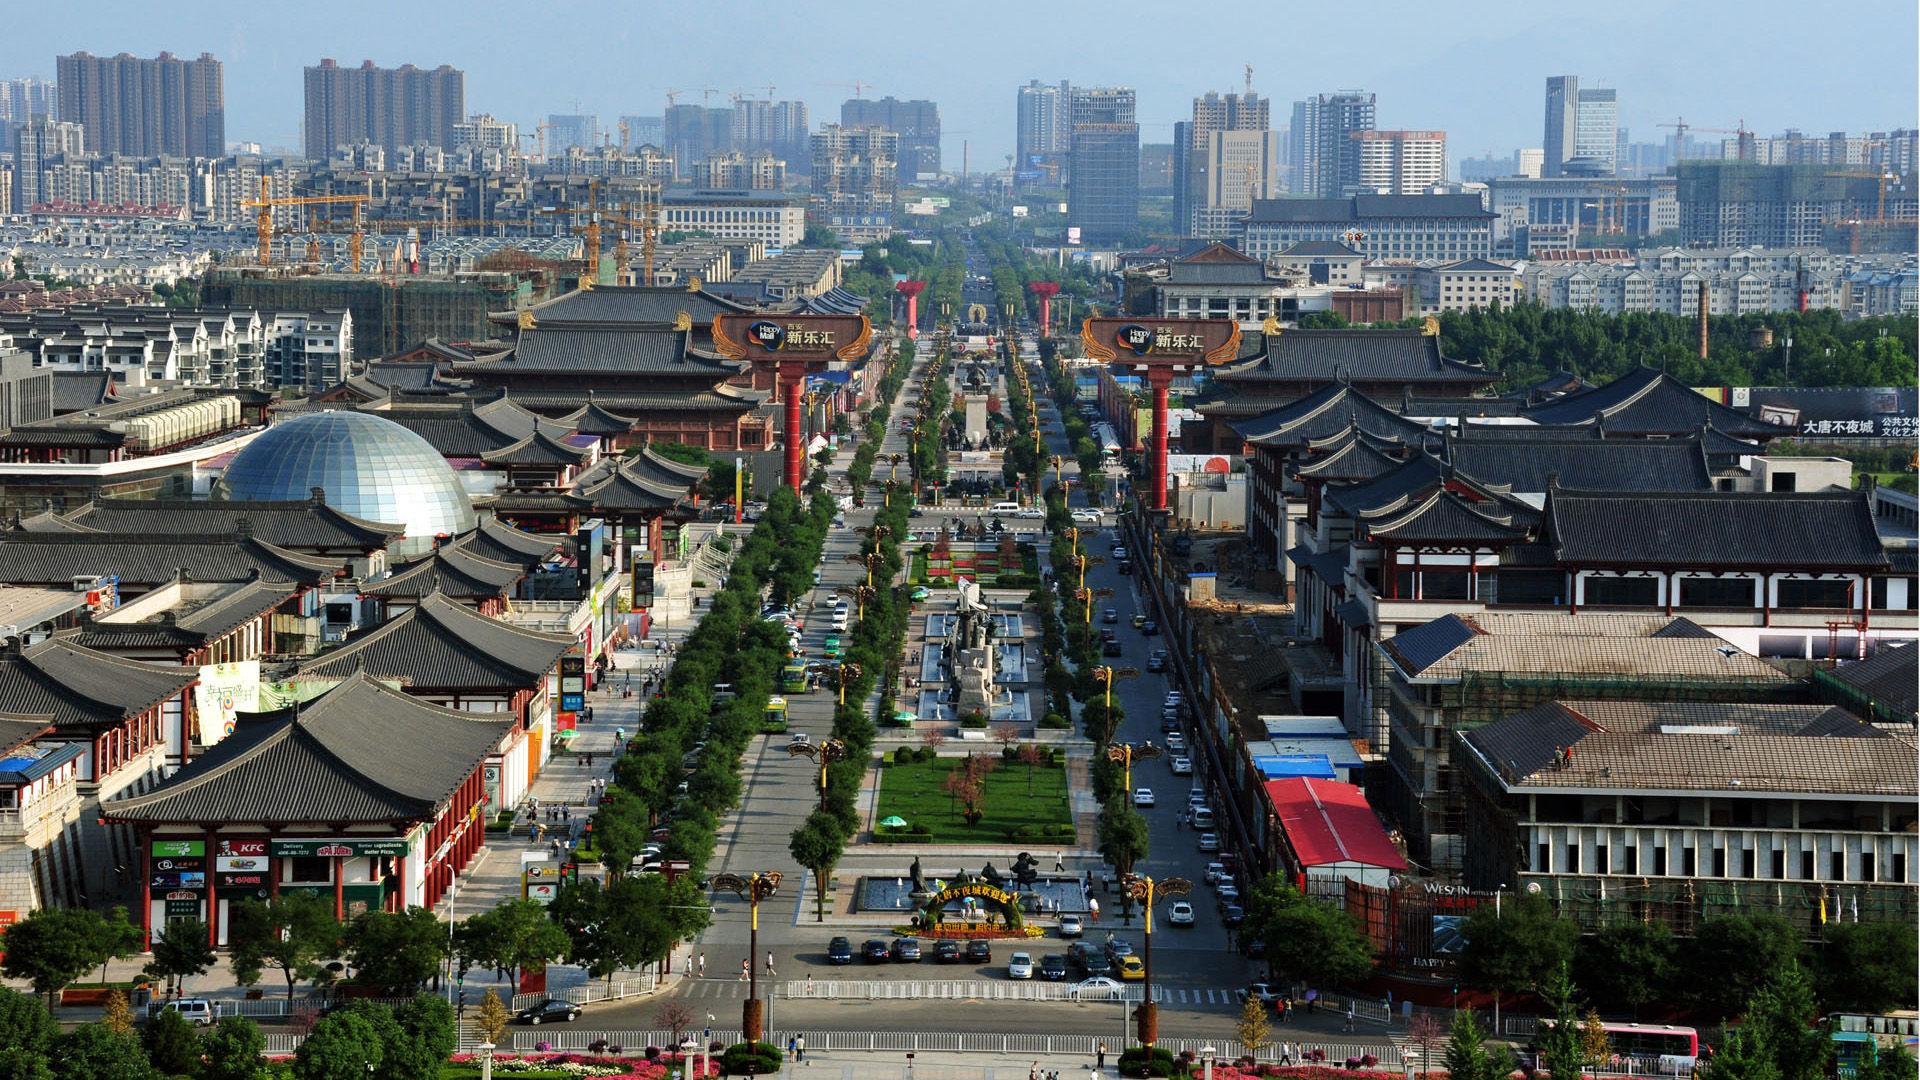 ¿A qué país pertenece Xi'an?